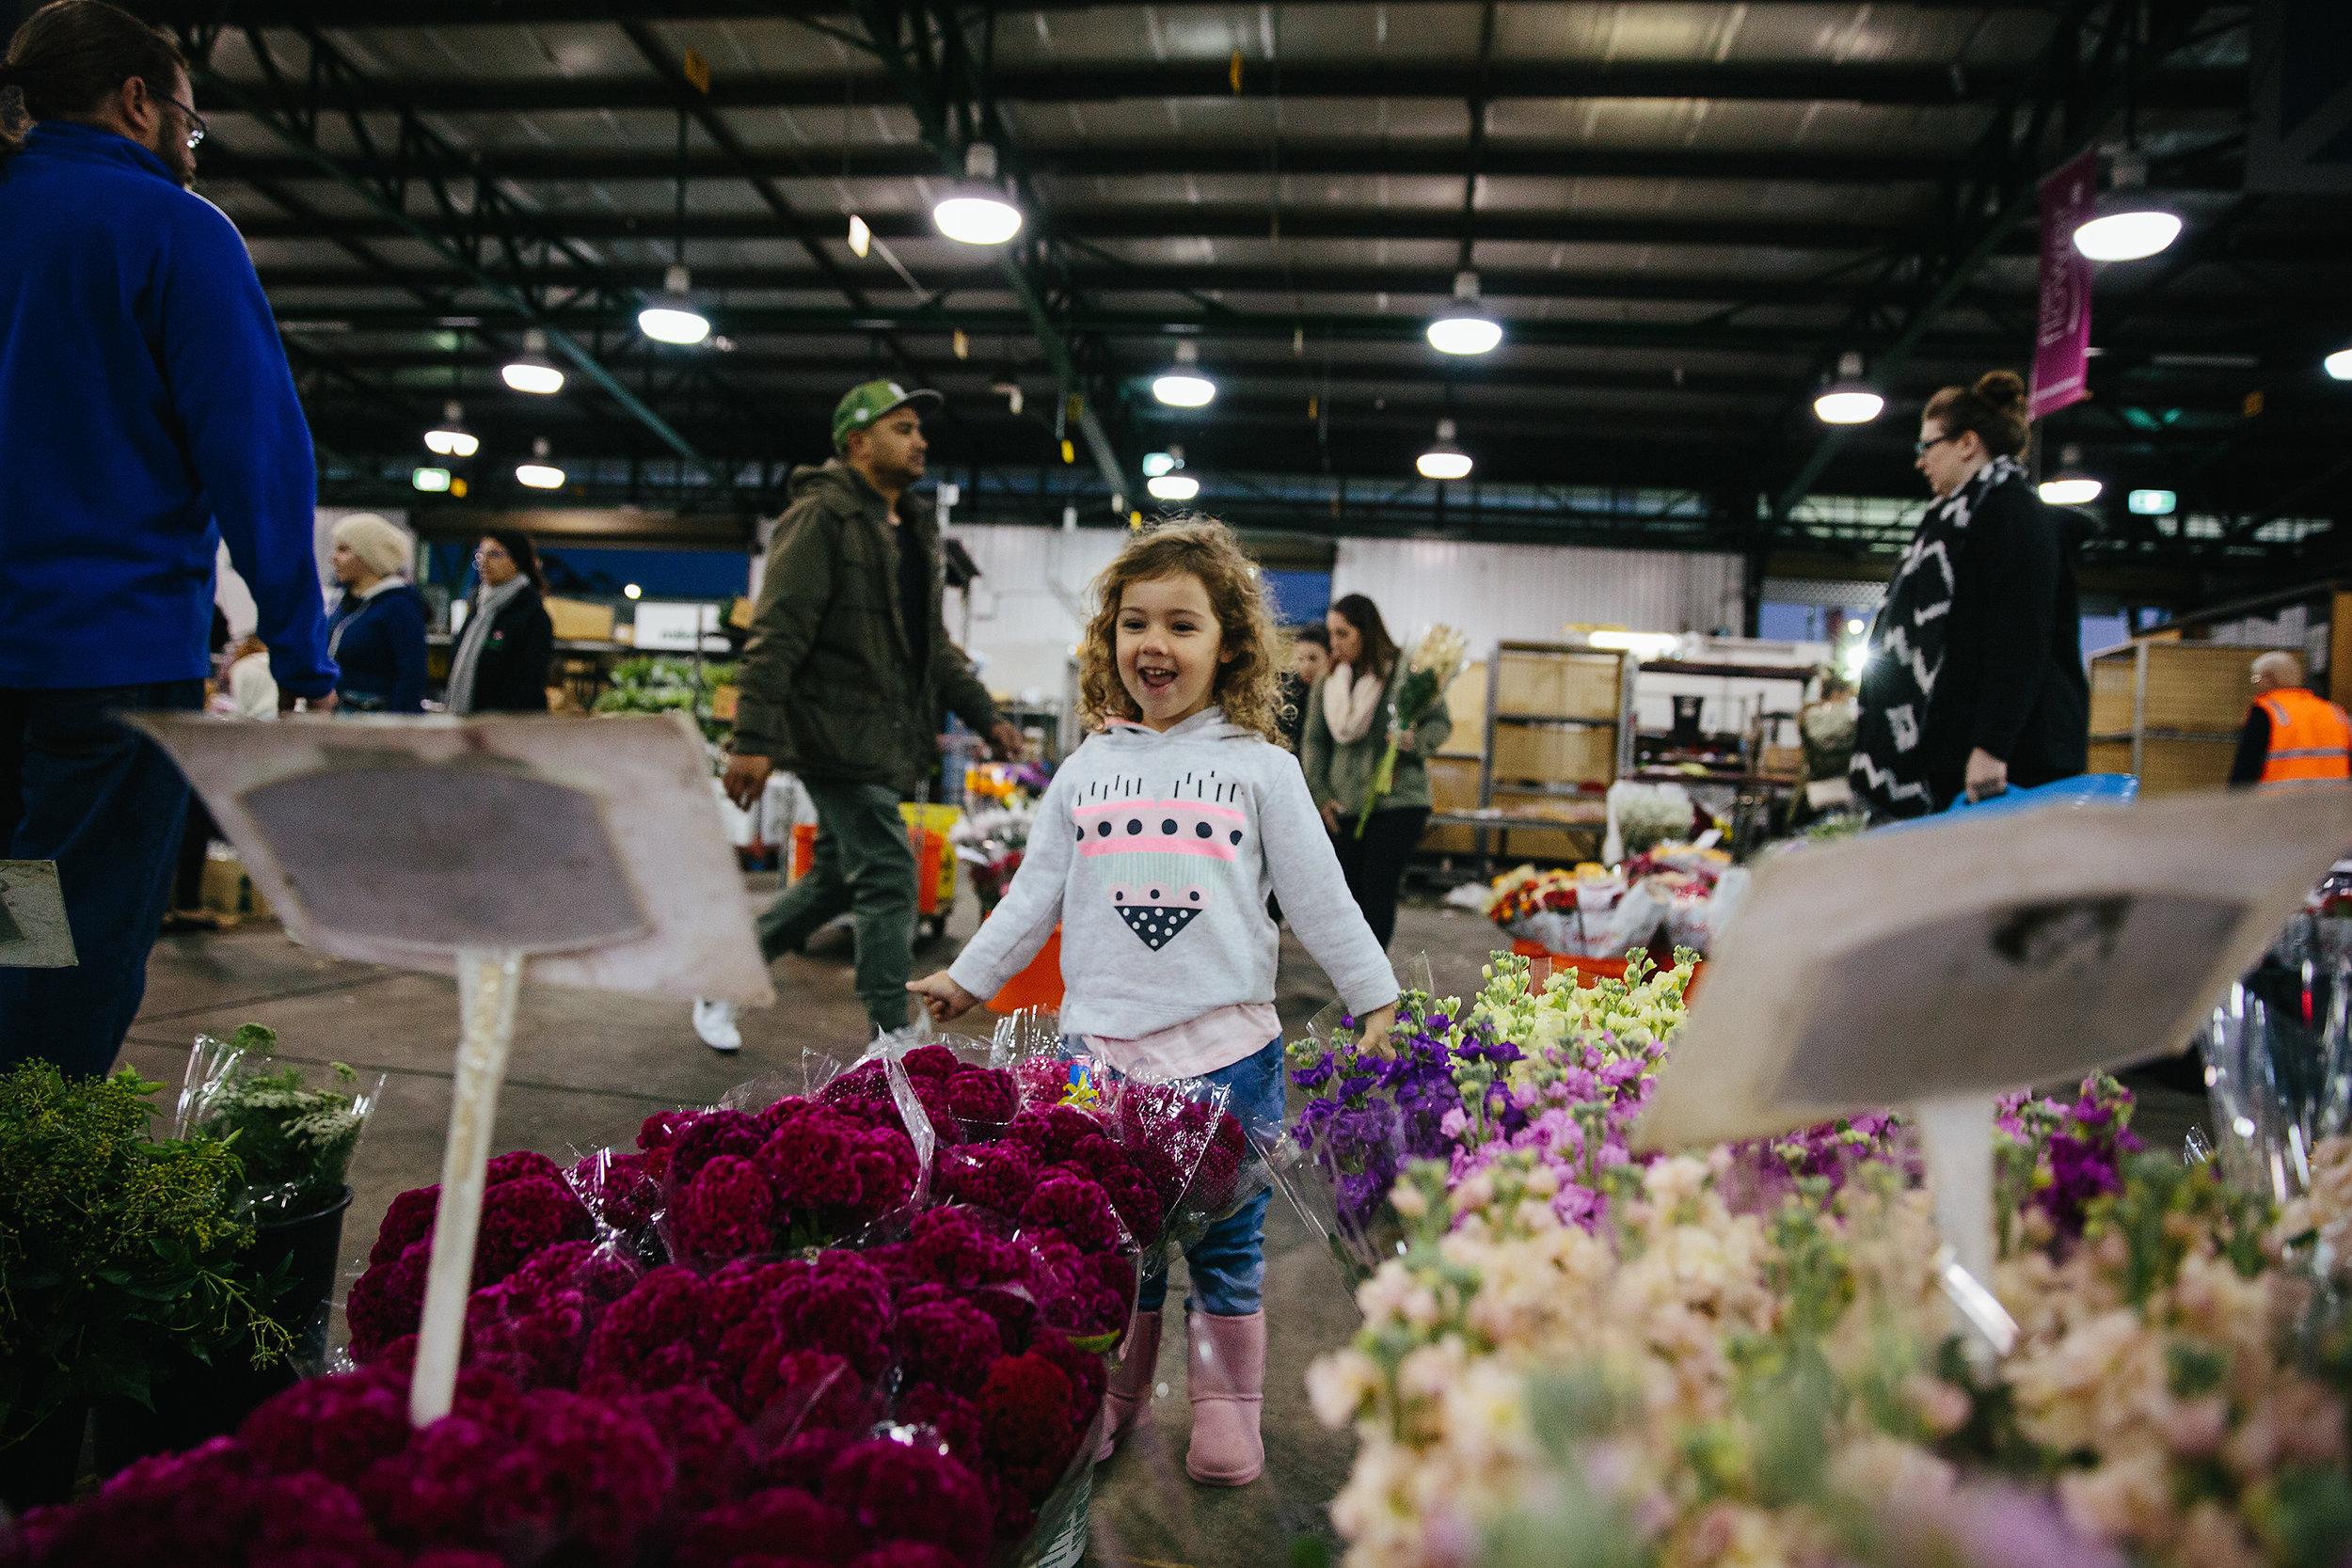 Hills District Photographer | Flower Markets